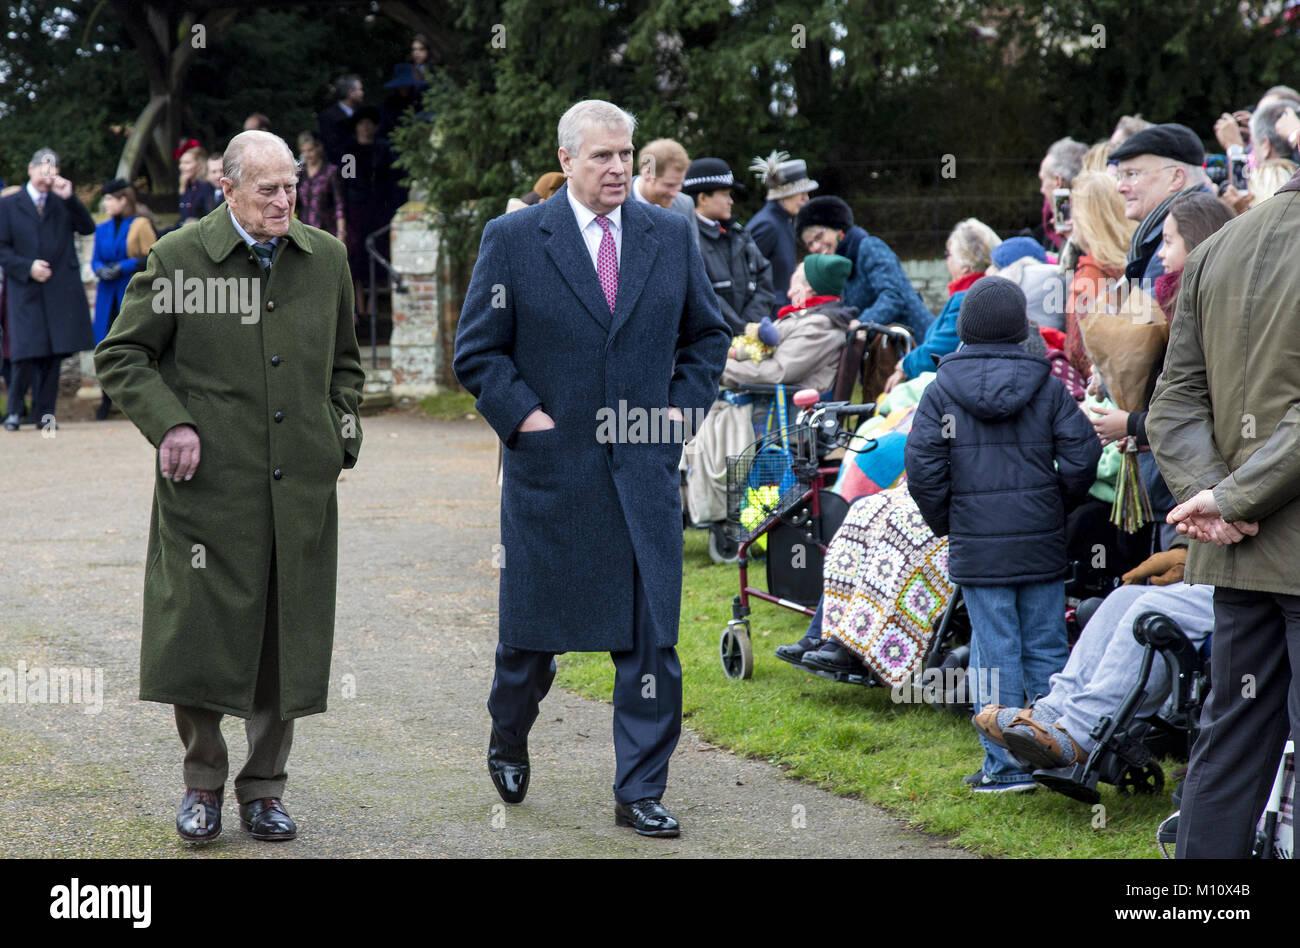 The British Royal family arrive at Sandringham to celebrate Christmas Day  Featuring: Duke of Edinburgh, Prince - Stock Image